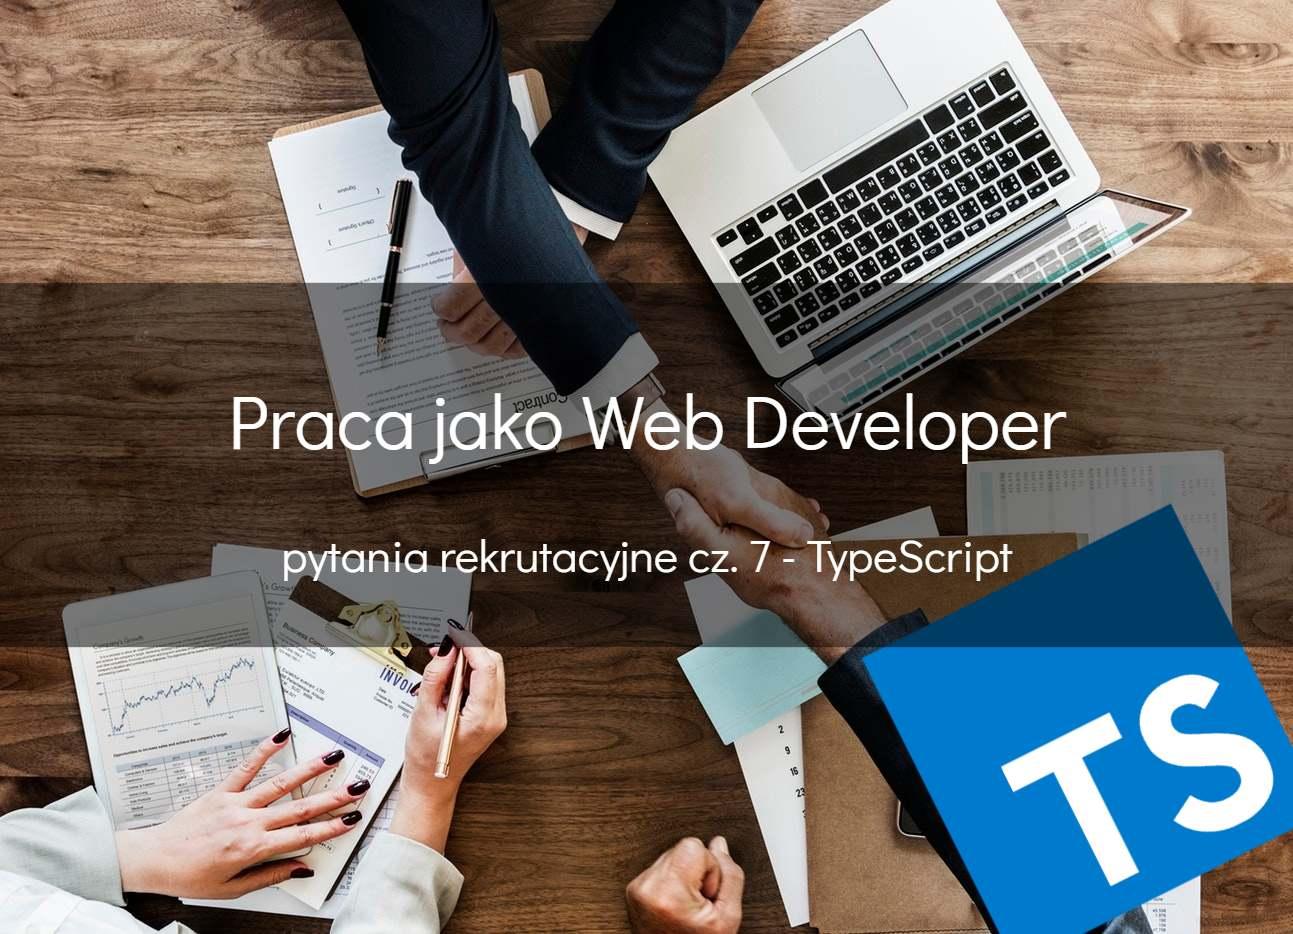 Web developer – pytania rekrutacyjne cz.7 – TypeScript